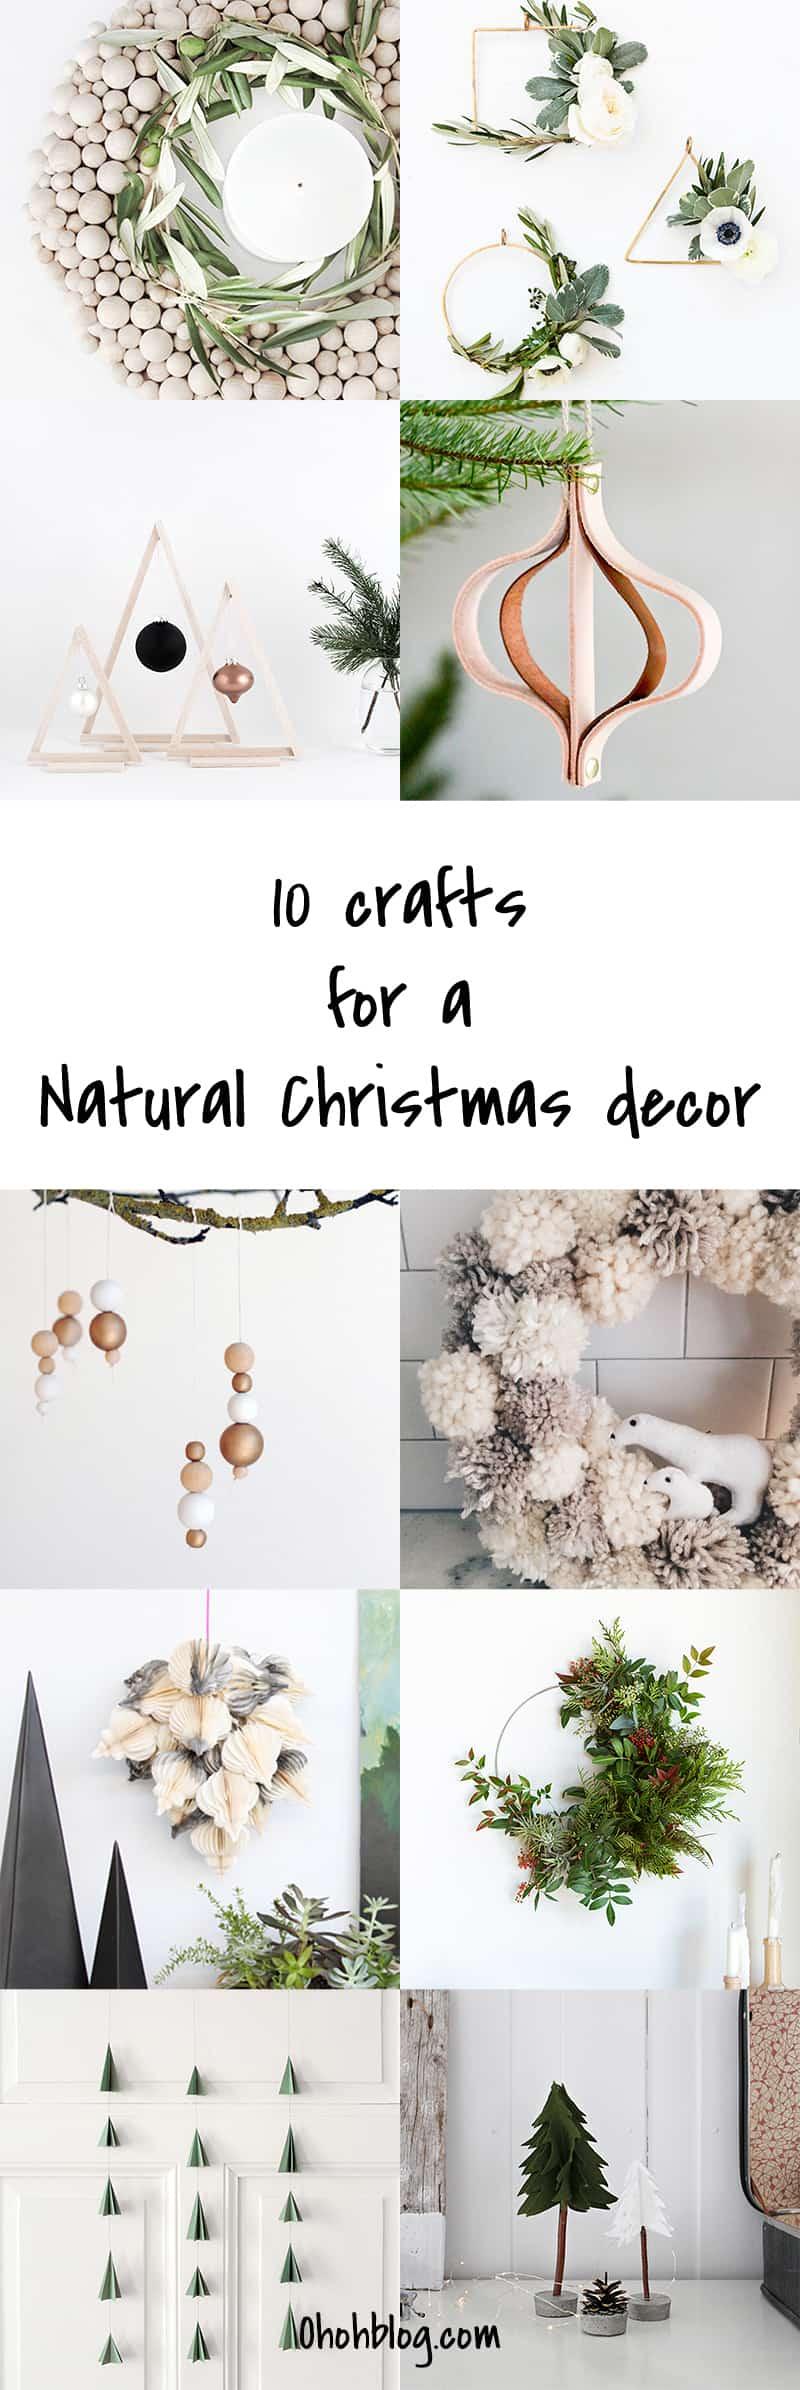 10 DIY Natural hygge Christmas decor